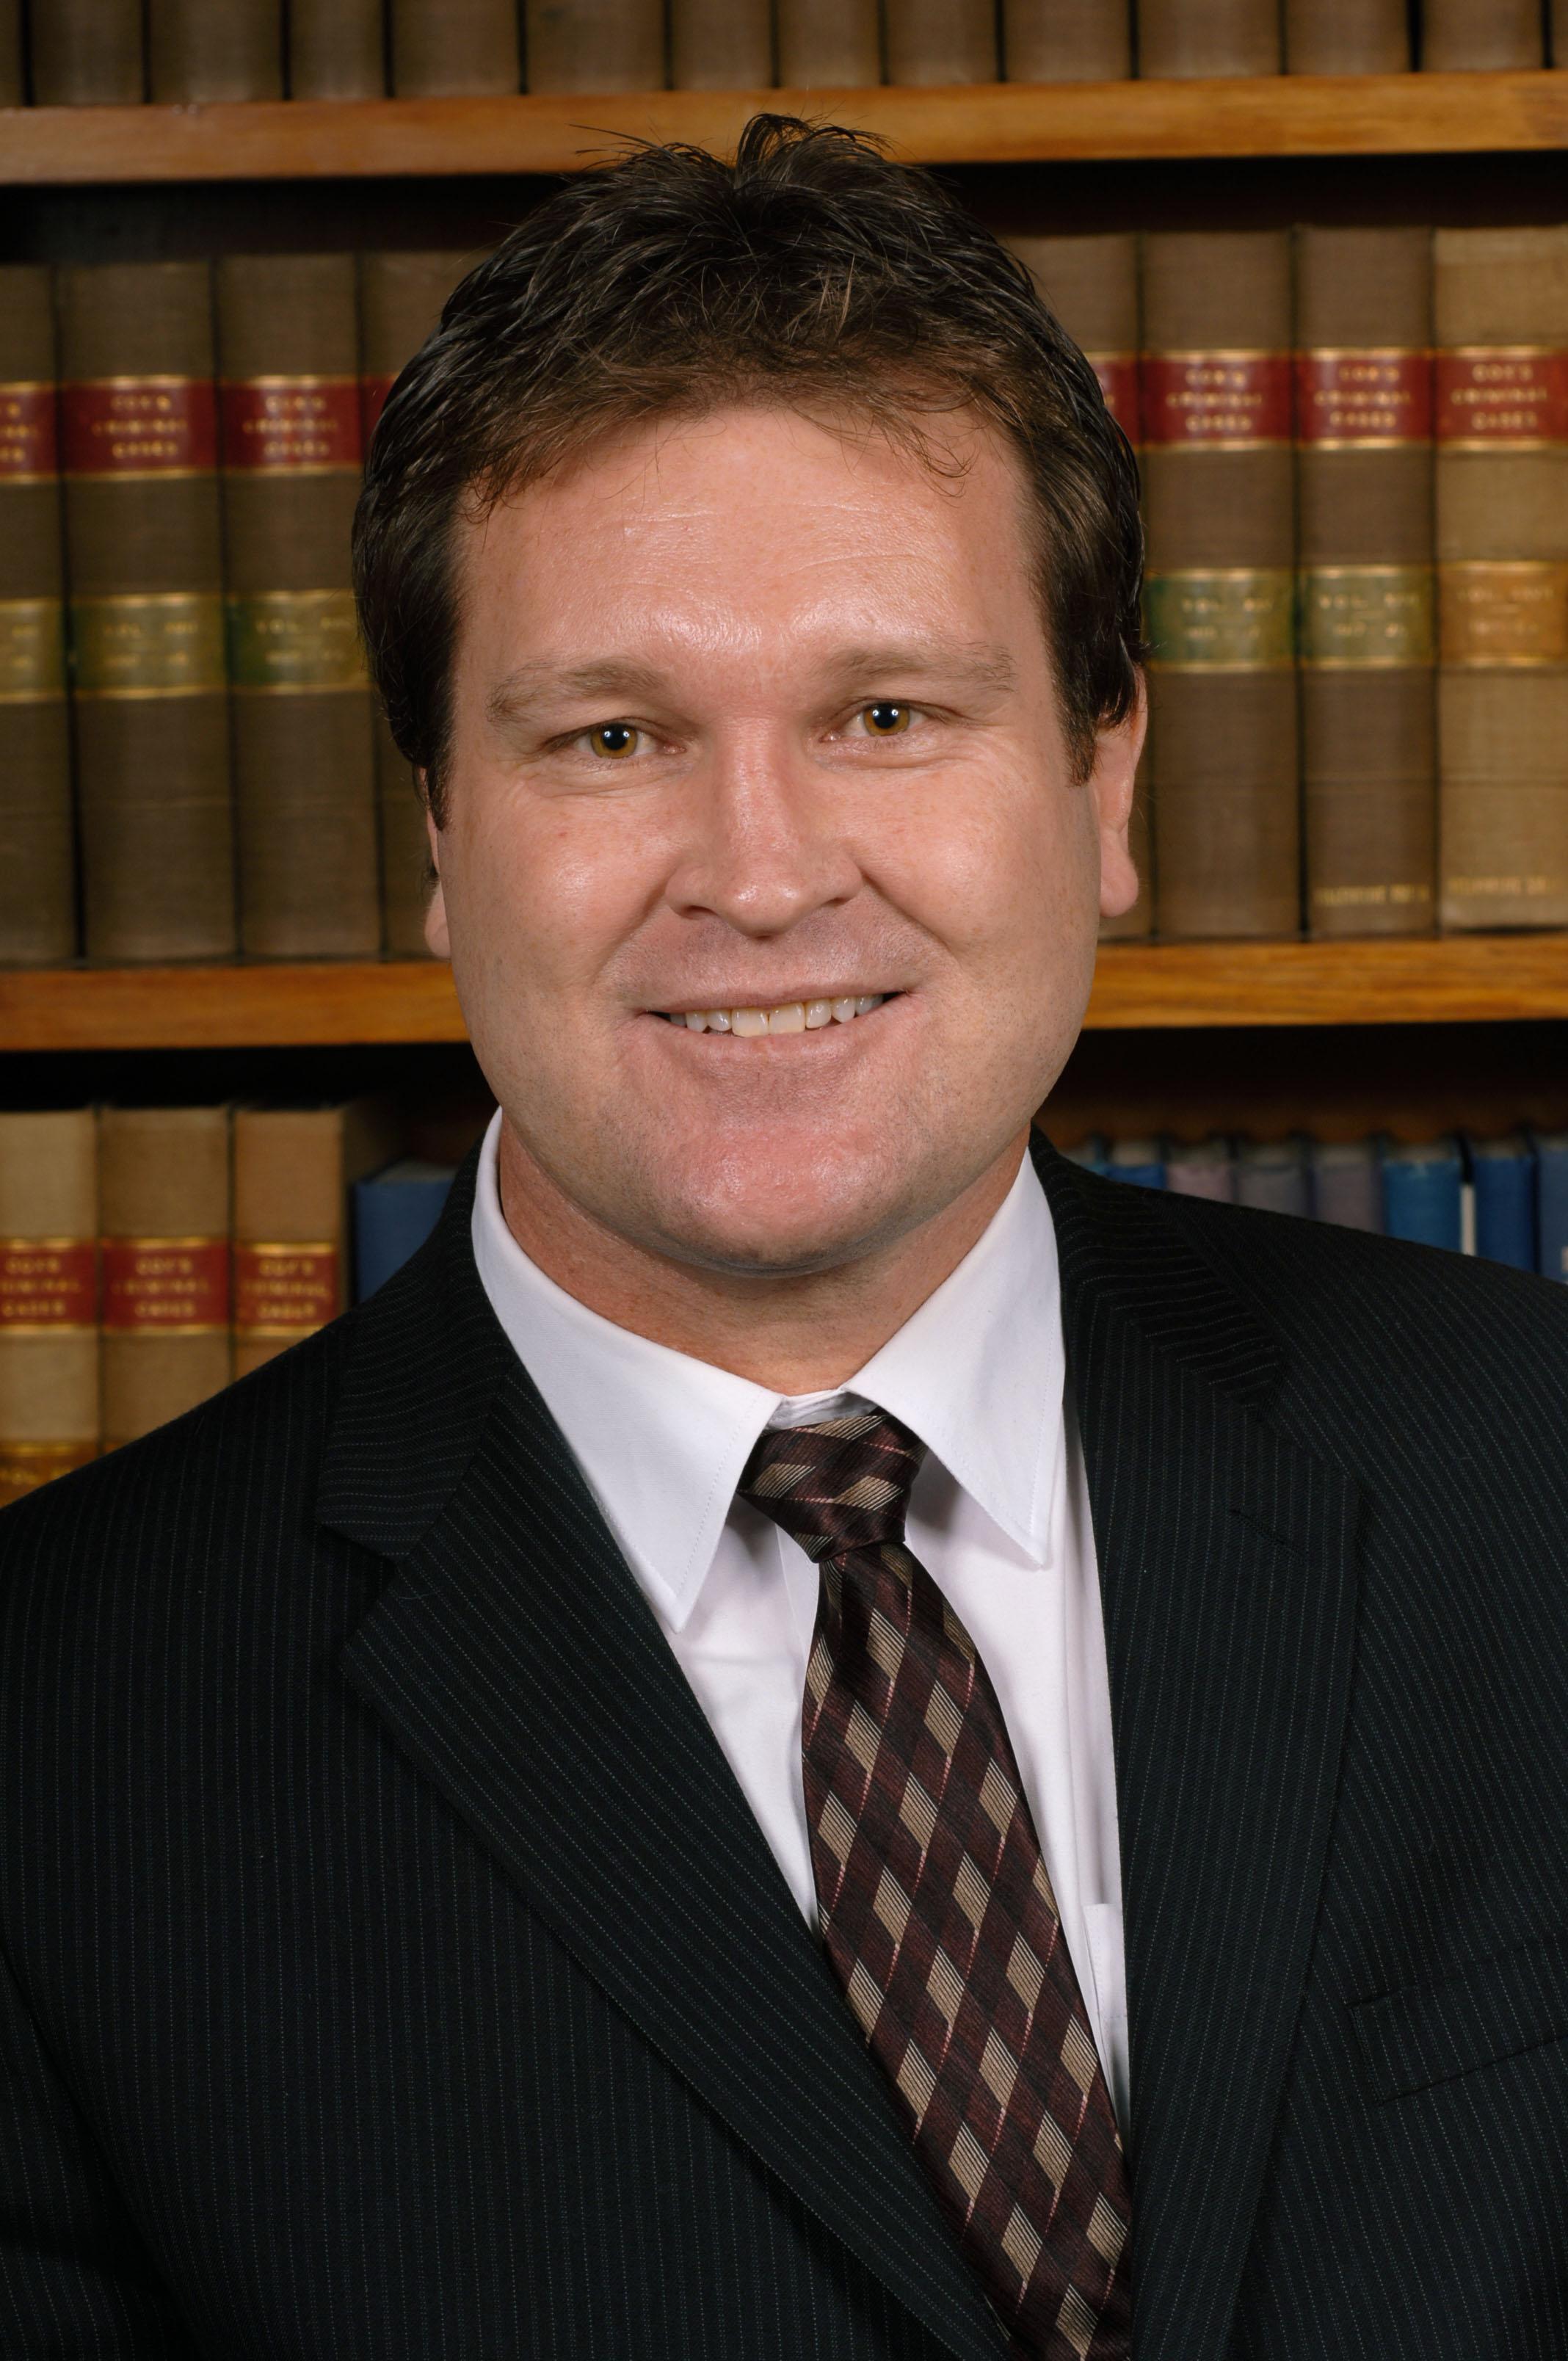 Wayne Henwood, LL.B (Hons)